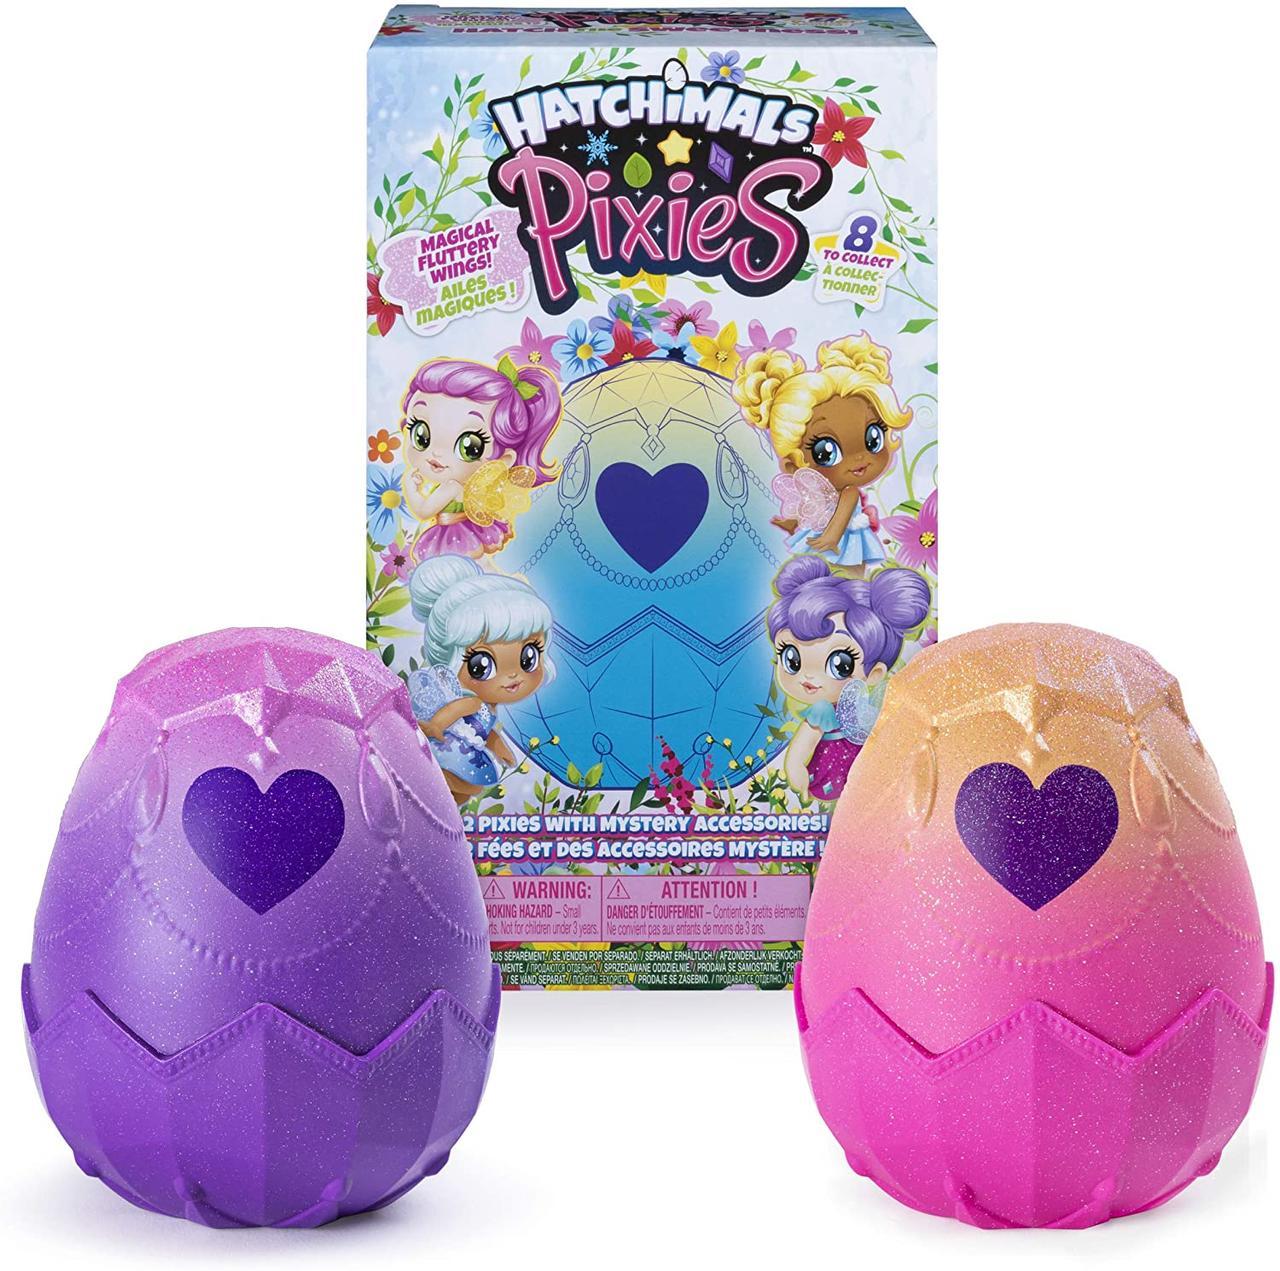 Набор 2 яйца с феями в яйцах хетчималс. Hatchimals Pixies, Spin Master, Оригинал из США